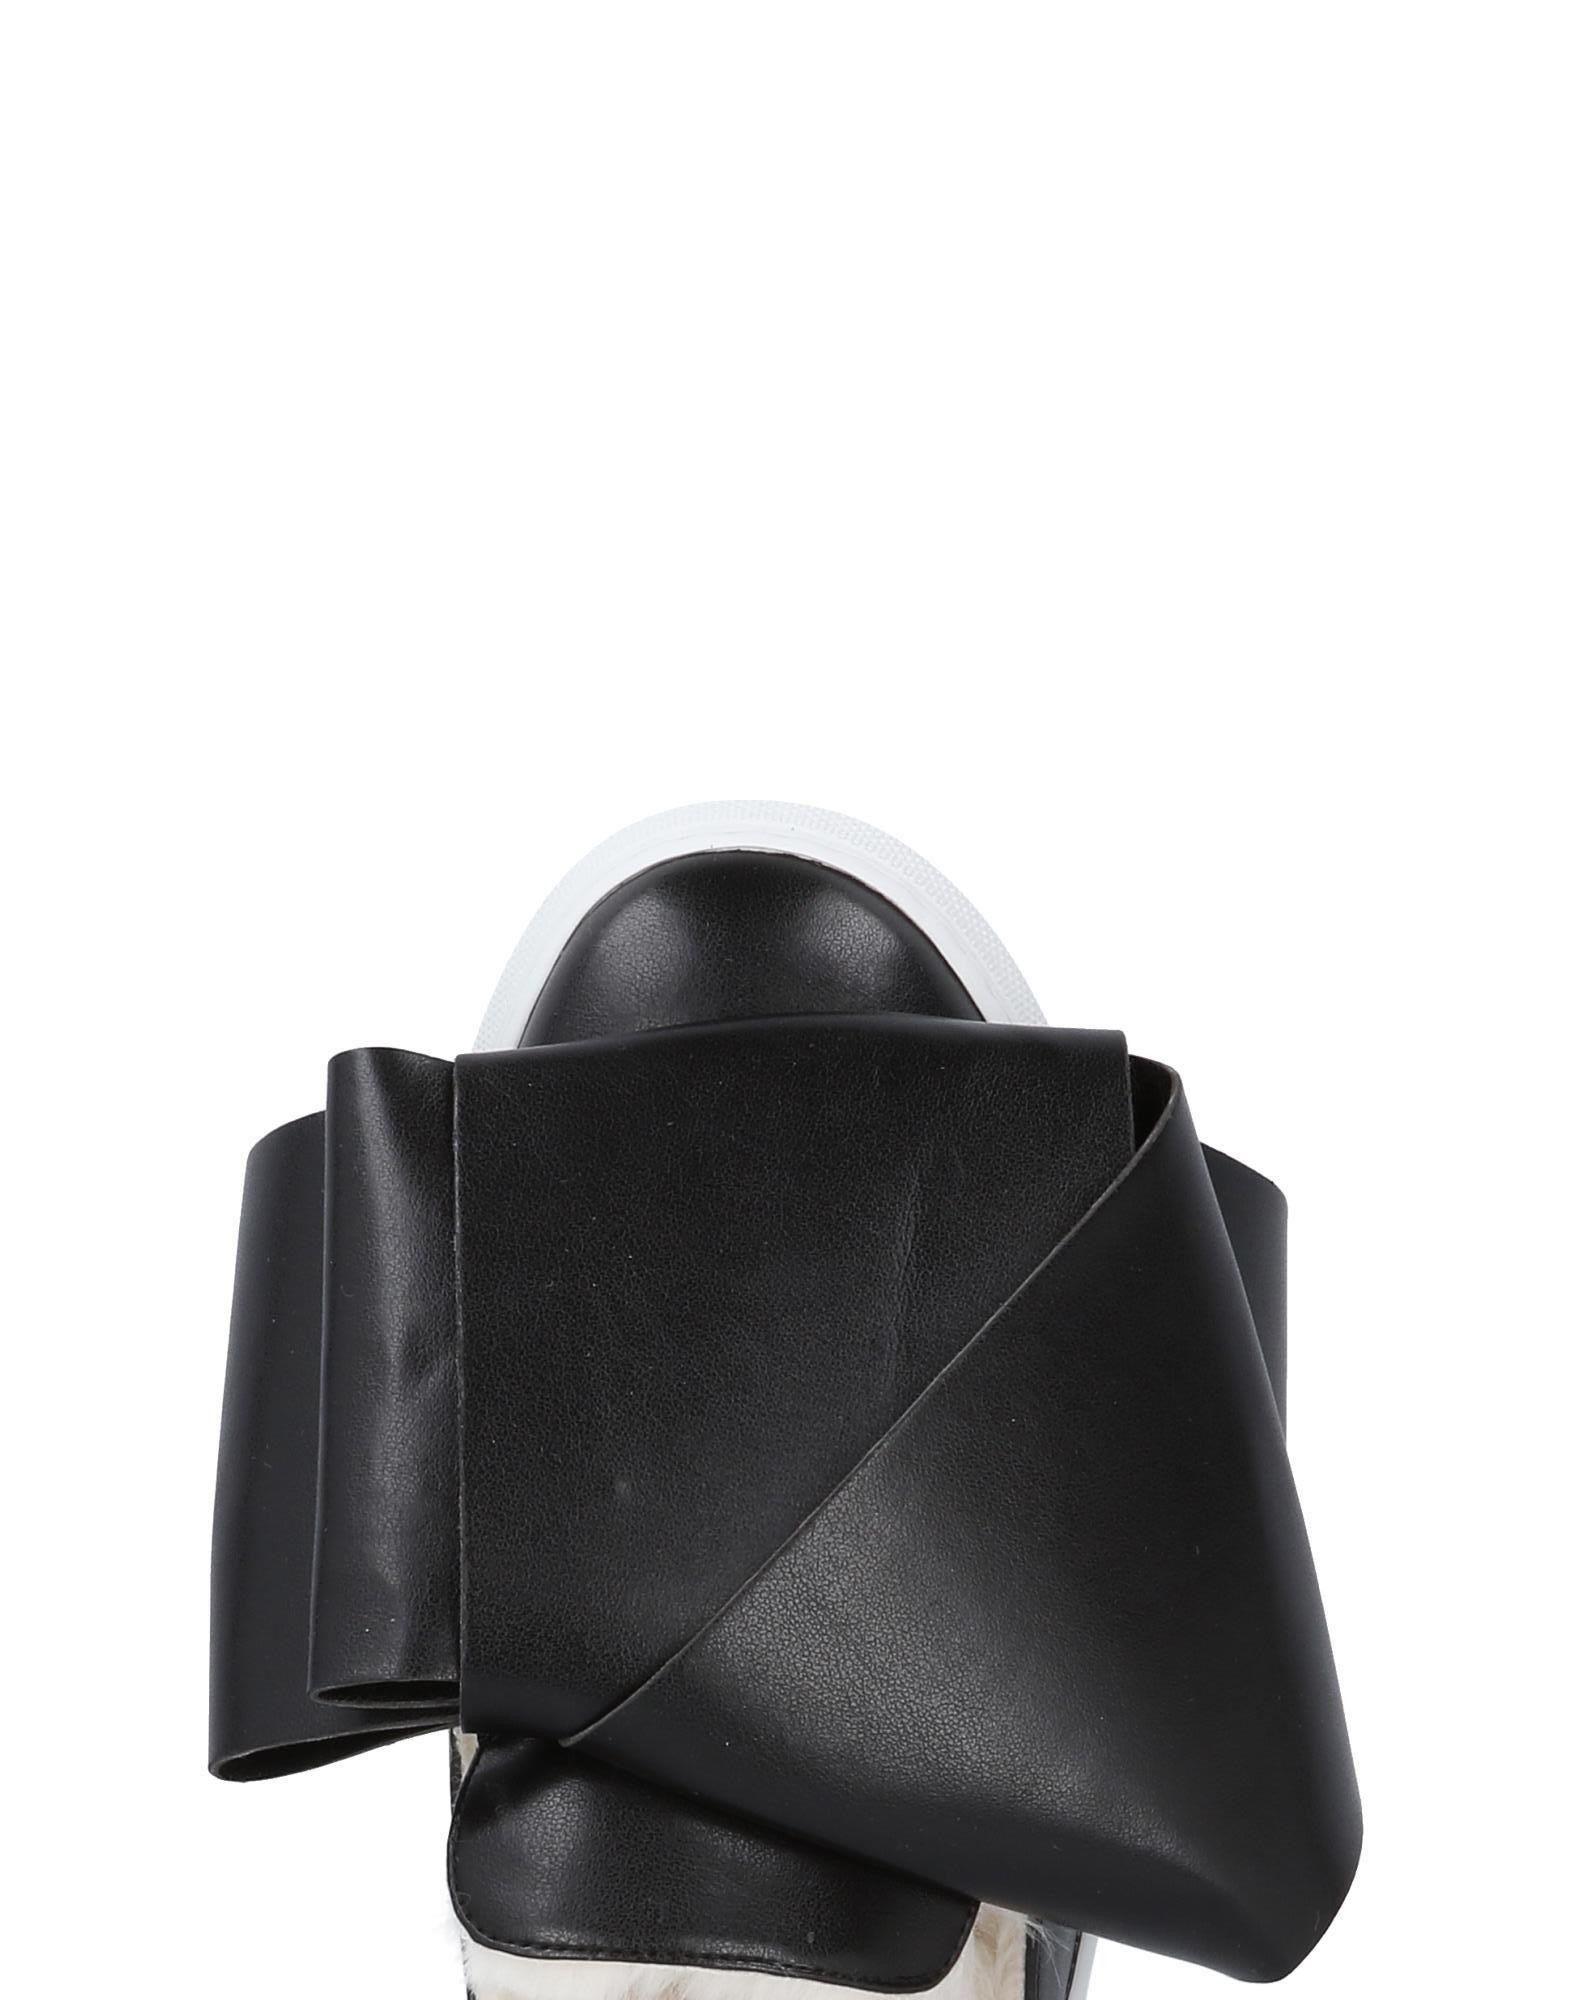 Olivia's Bow Sandalen Sandalen Bow Damen  11489085UB Gute Qualität beliebte Schuhe 705abf